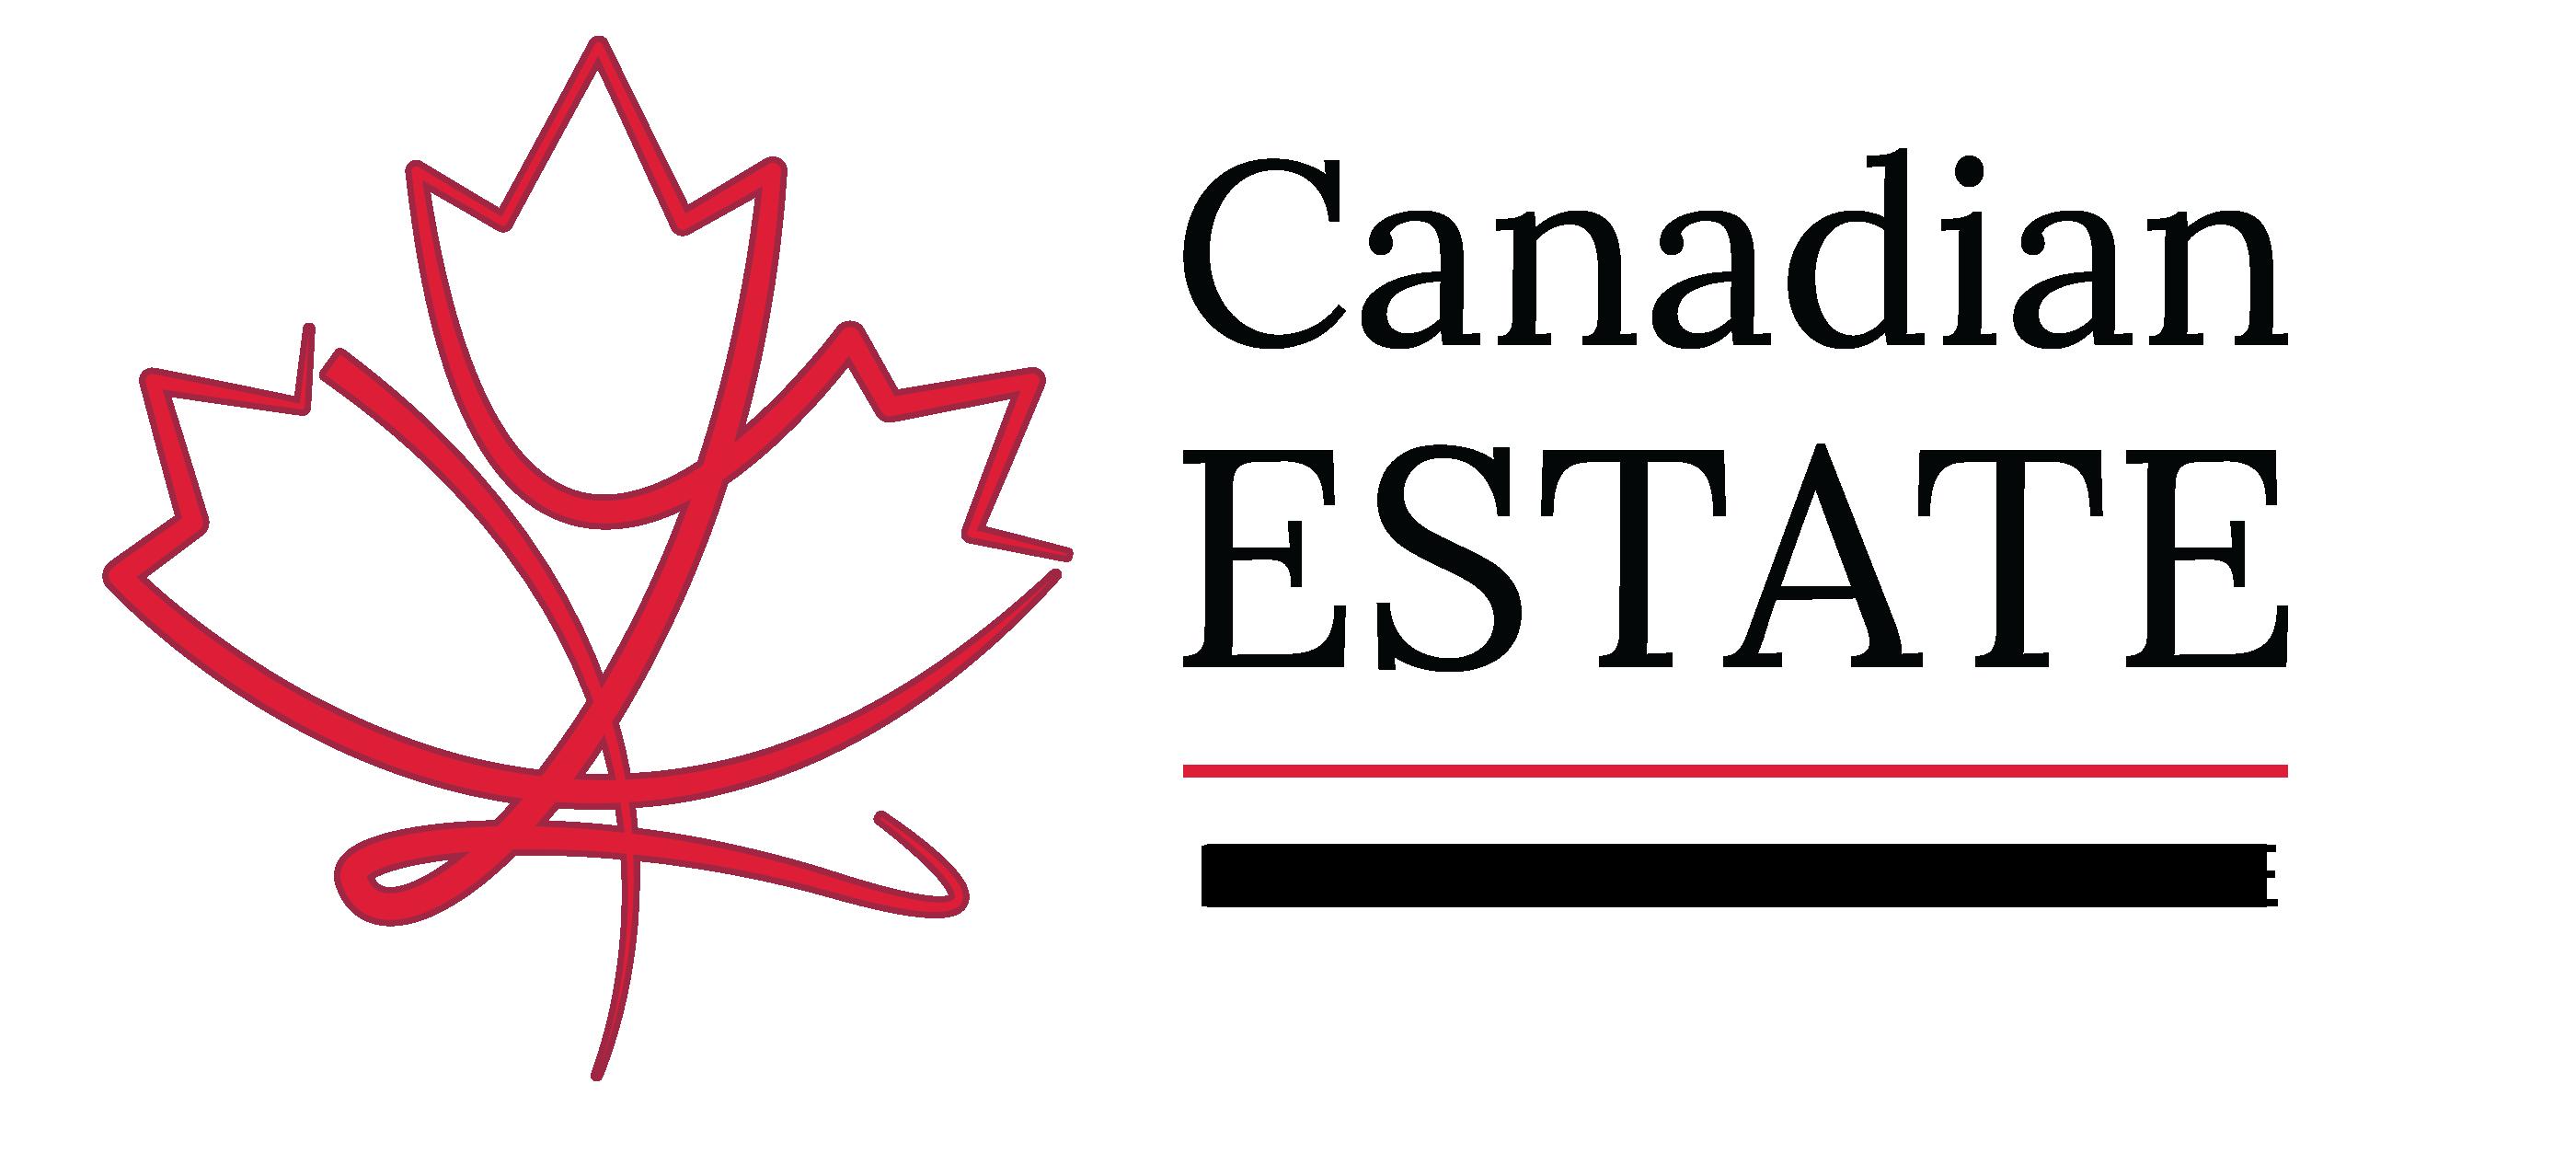 Plan My Estate | Canadian Estate Planning Guide